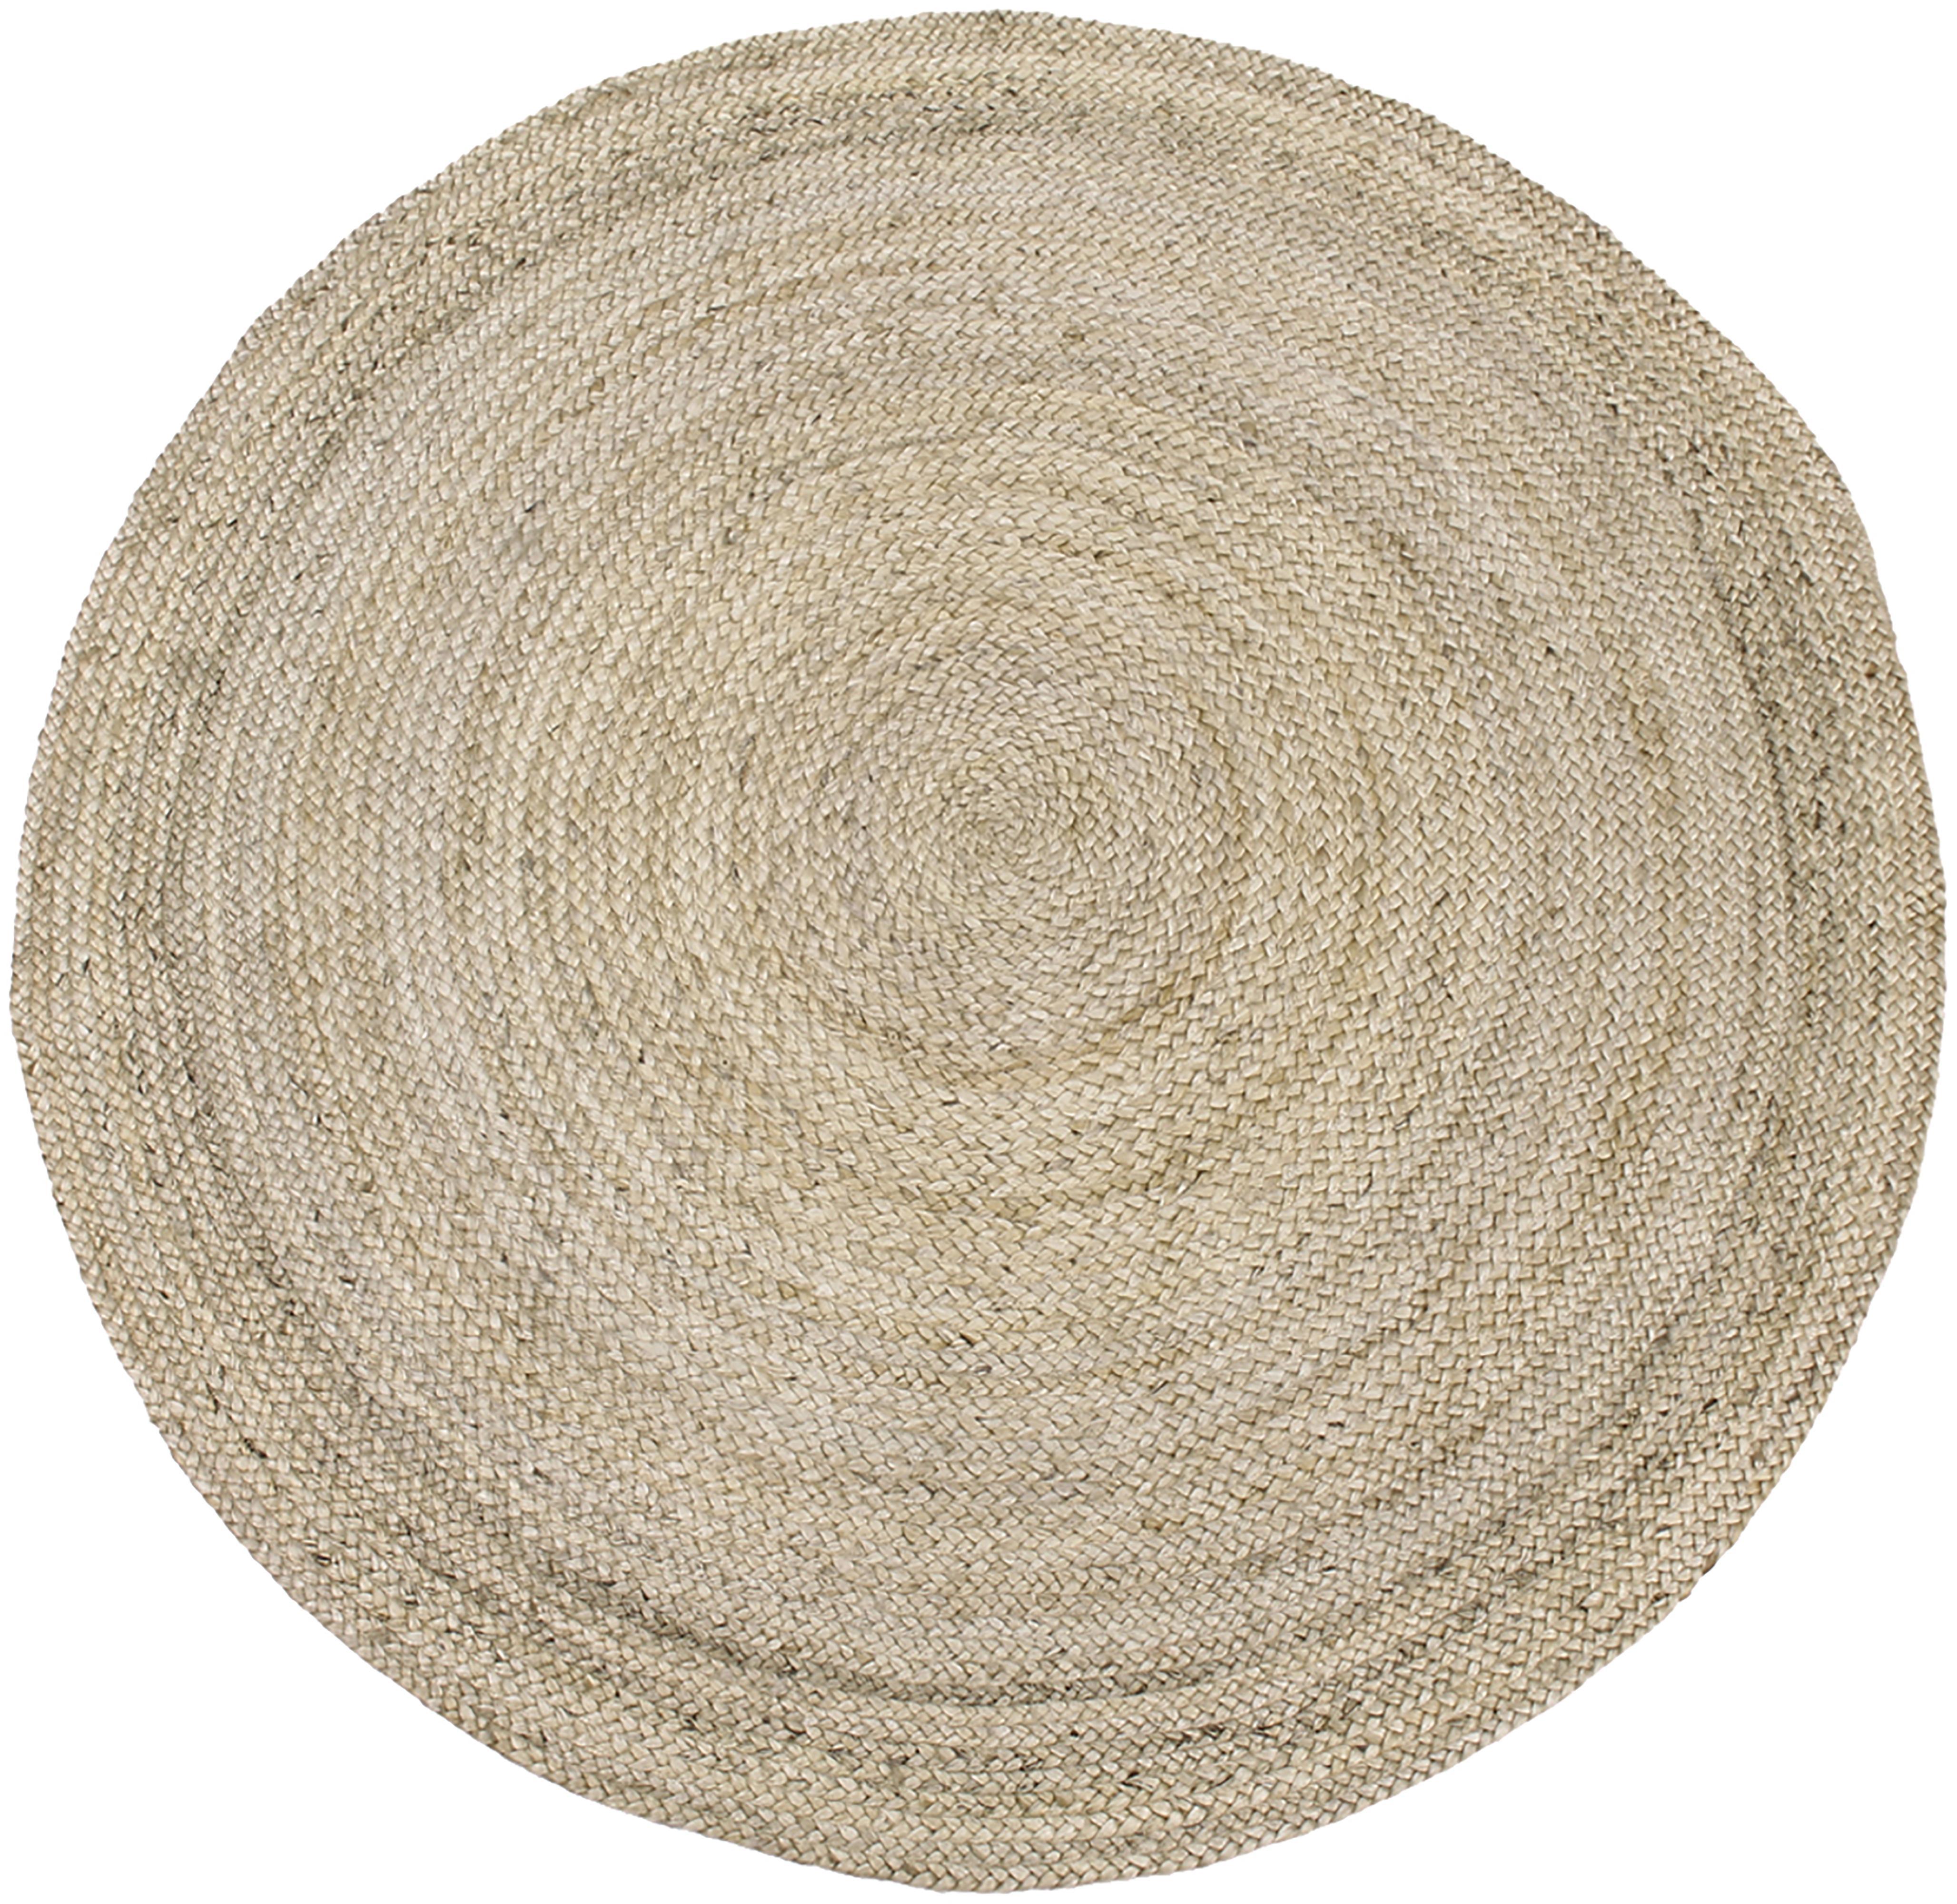 Tappeto in juta tessuto a mano Sharmila, Beige, Ø 140 cm (taglia M)